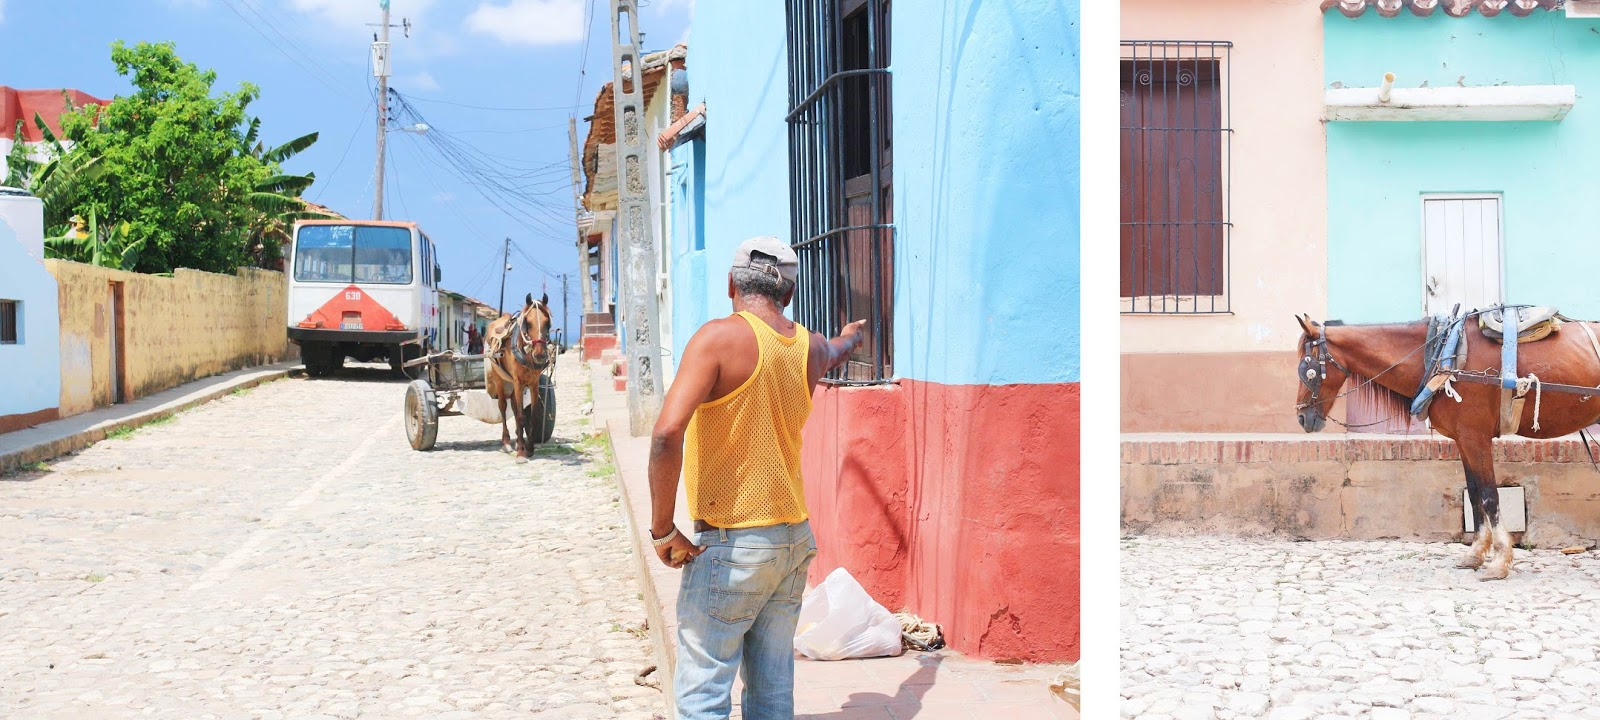 Un homme et son cheval, Trinidad - Cuba